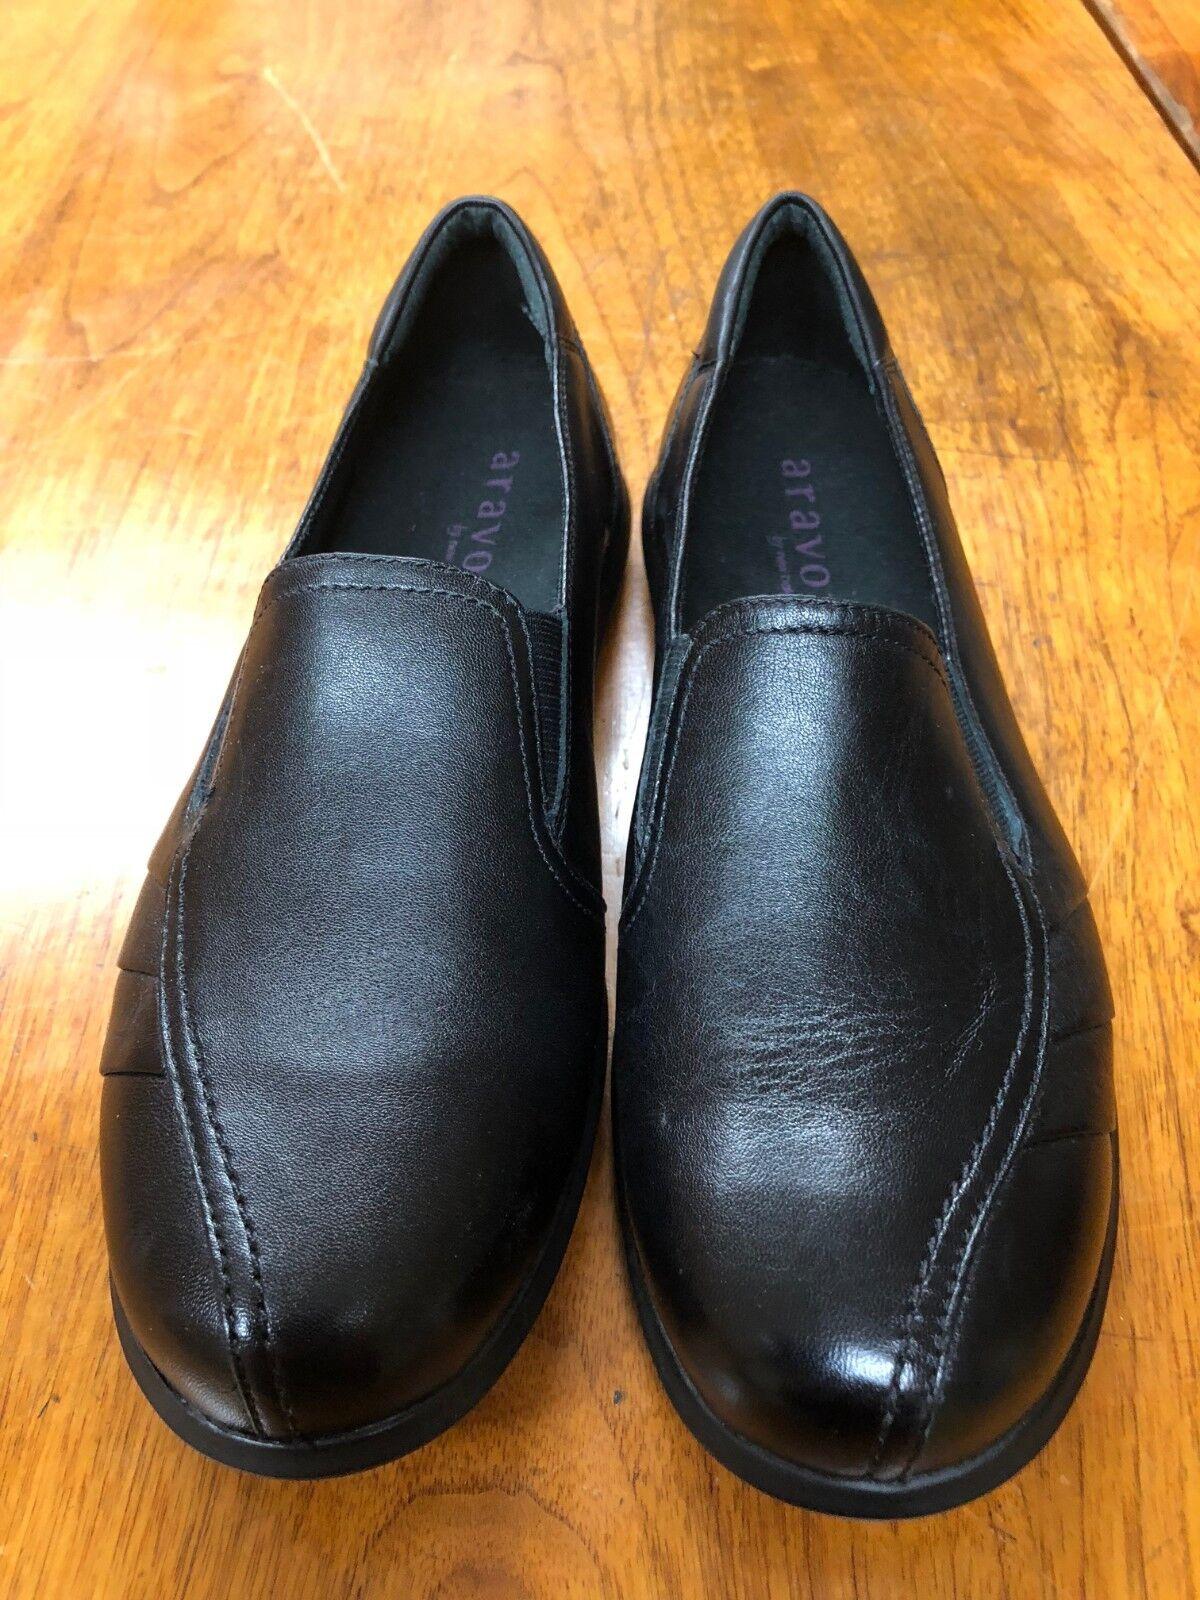 Aravon-New-Balance-WEF13BK-Negro-Cuero-Slip - on-Zapatos-Mujer-flats nosotros tamaño 9 B